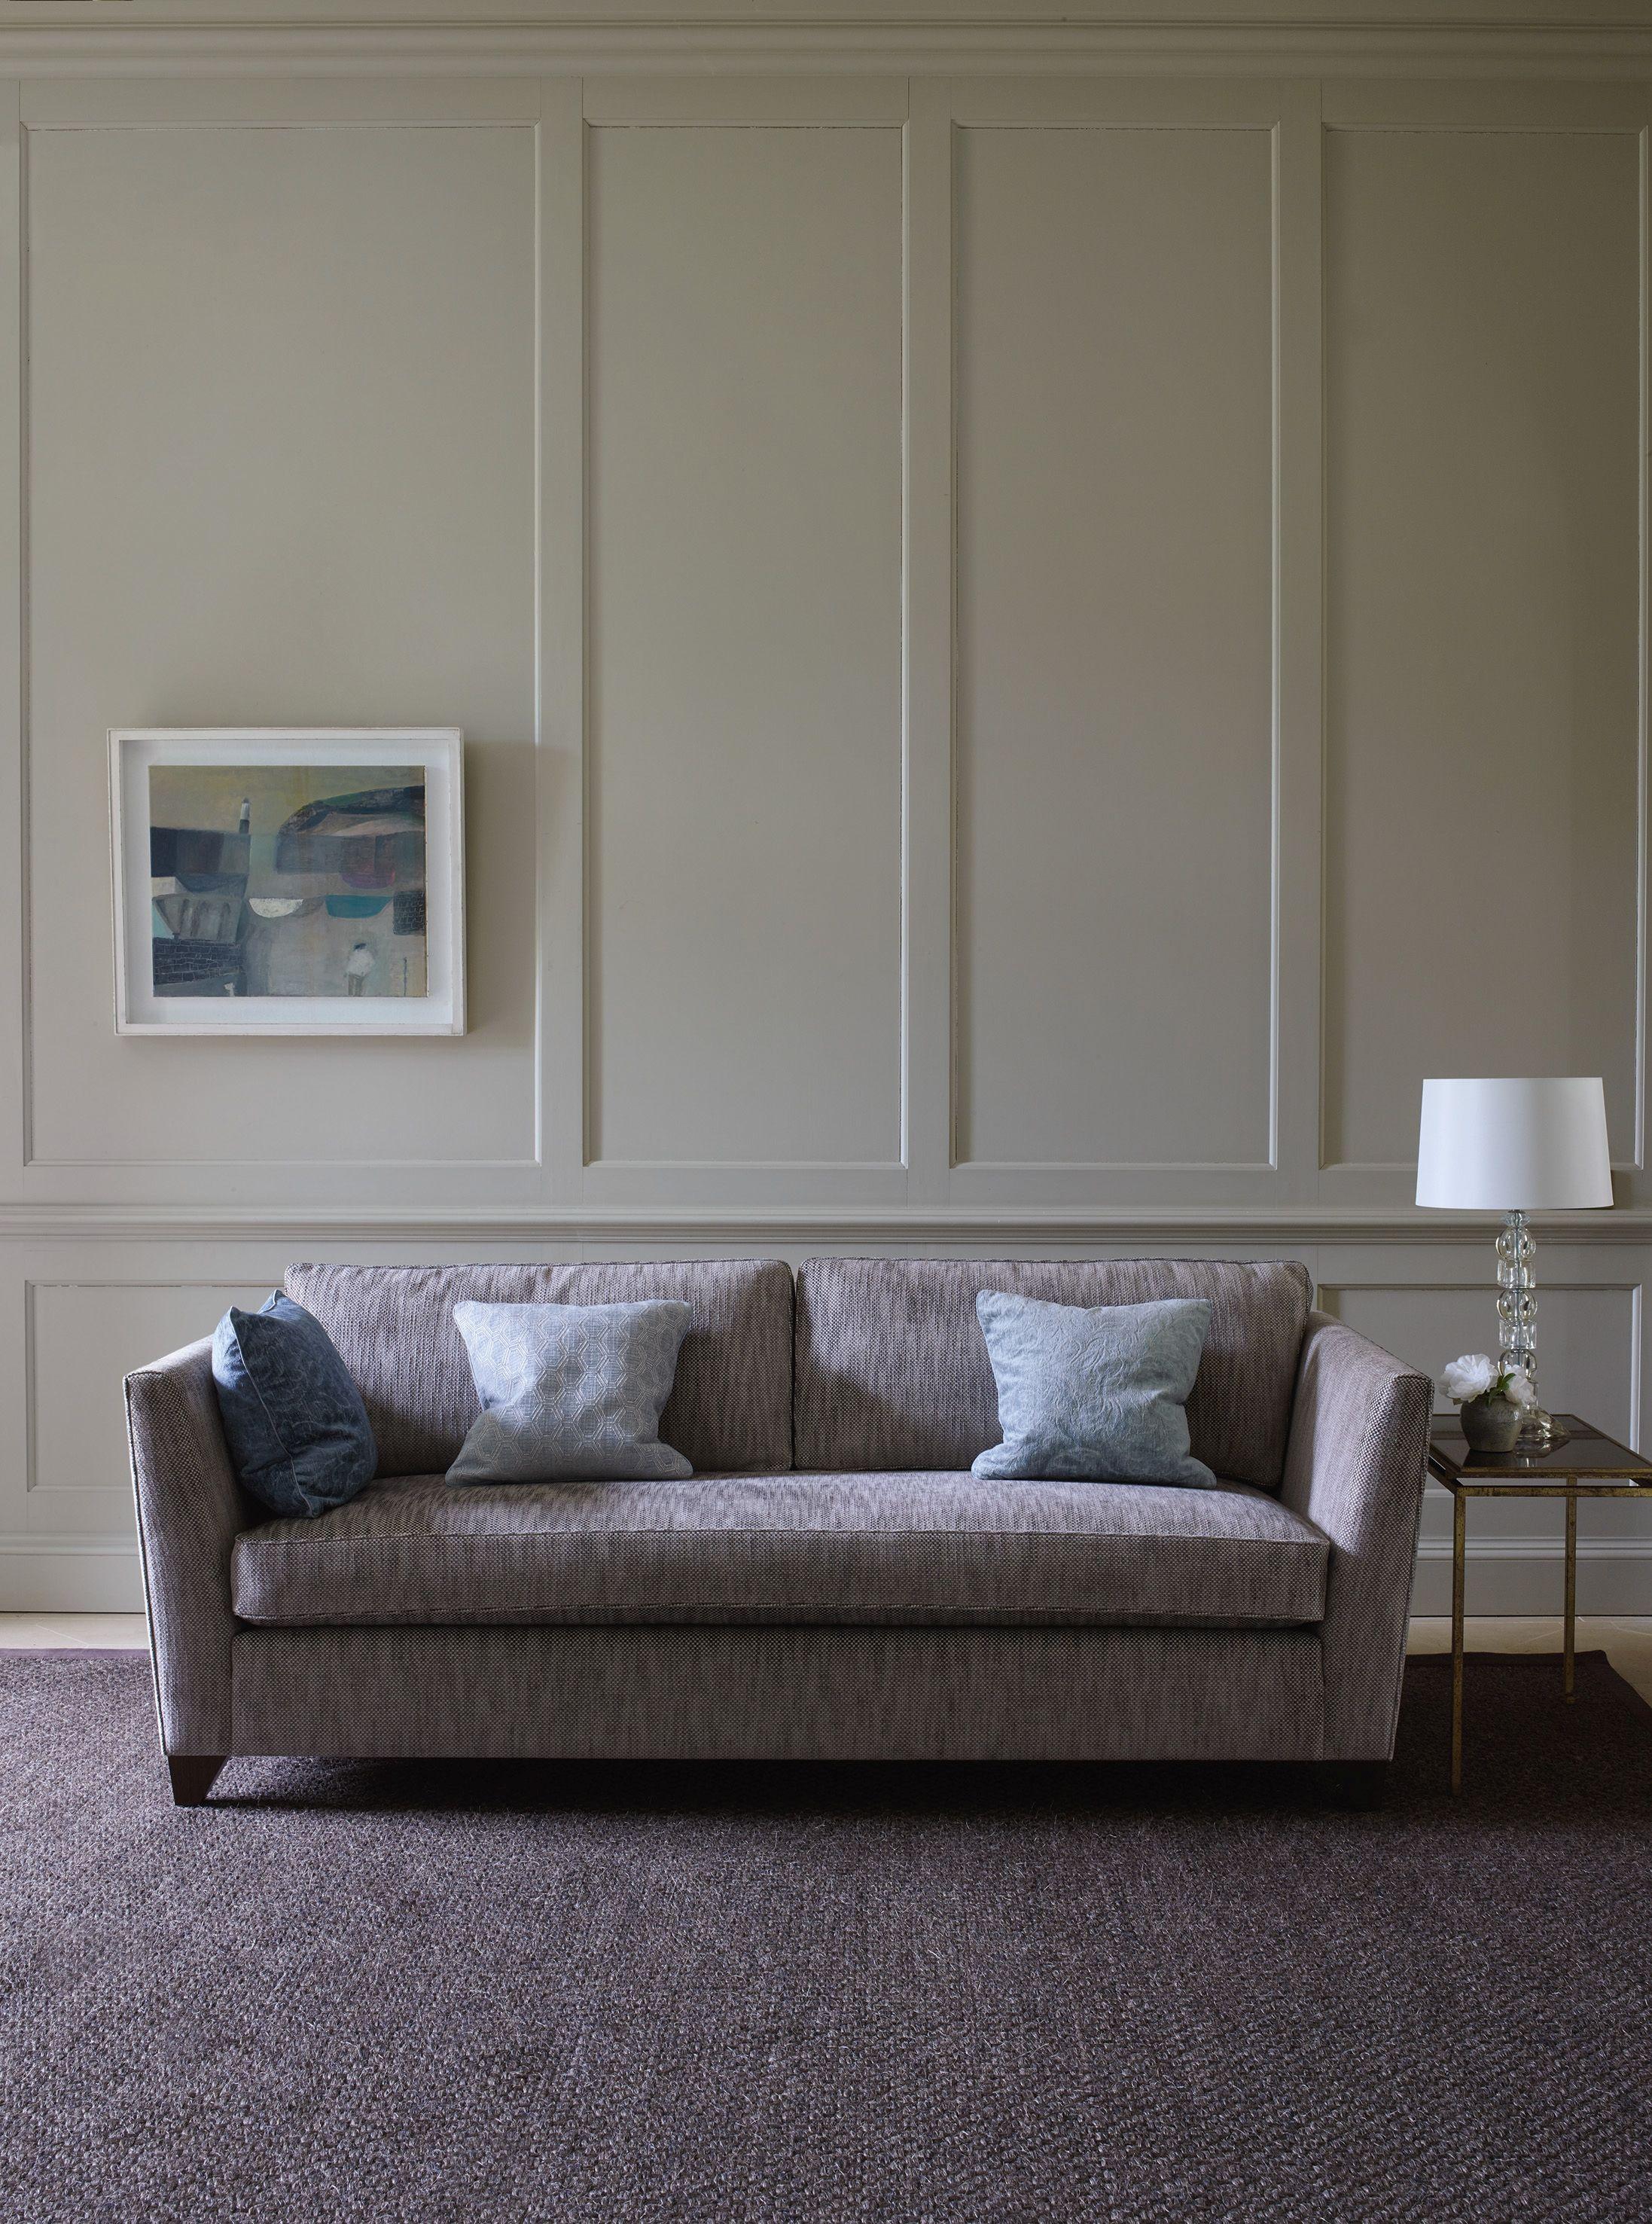 Anderson sofa by King e Sofas King e Sofas